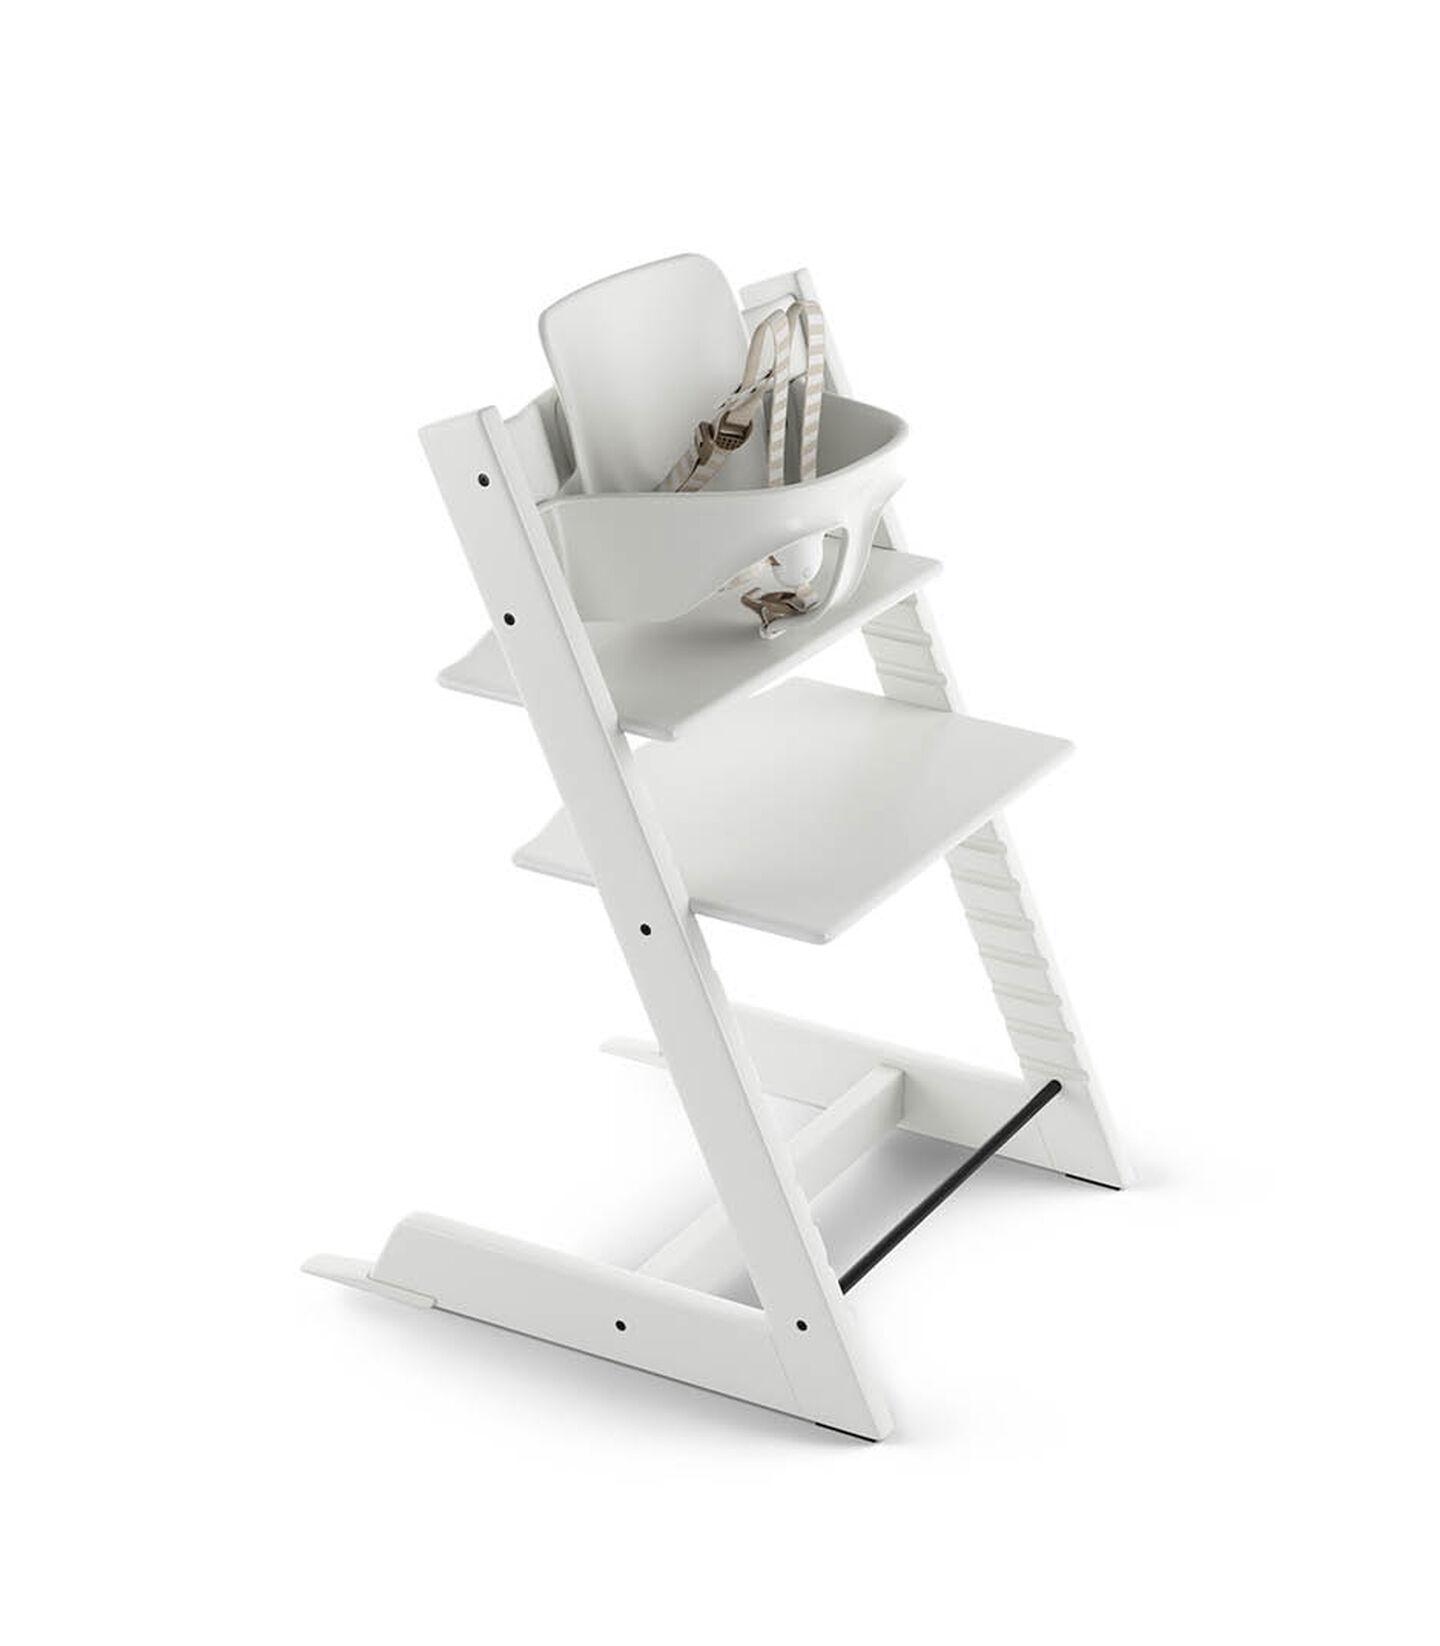 Tripp Trapp® Bundle High Chair US 18 White, White, mainview view 2